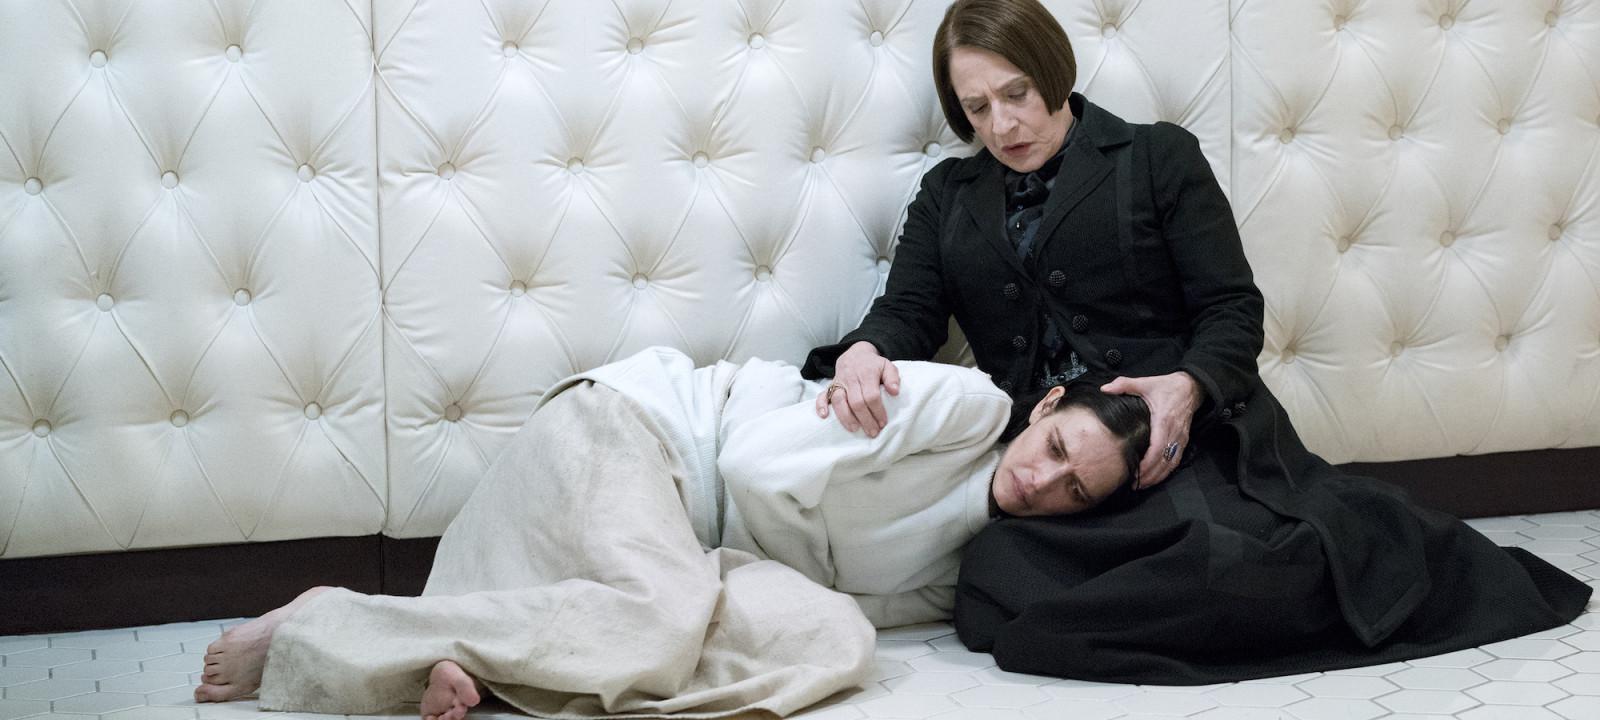 Eva Green and Patti LuPone star in Penny Dreadful Season Three.